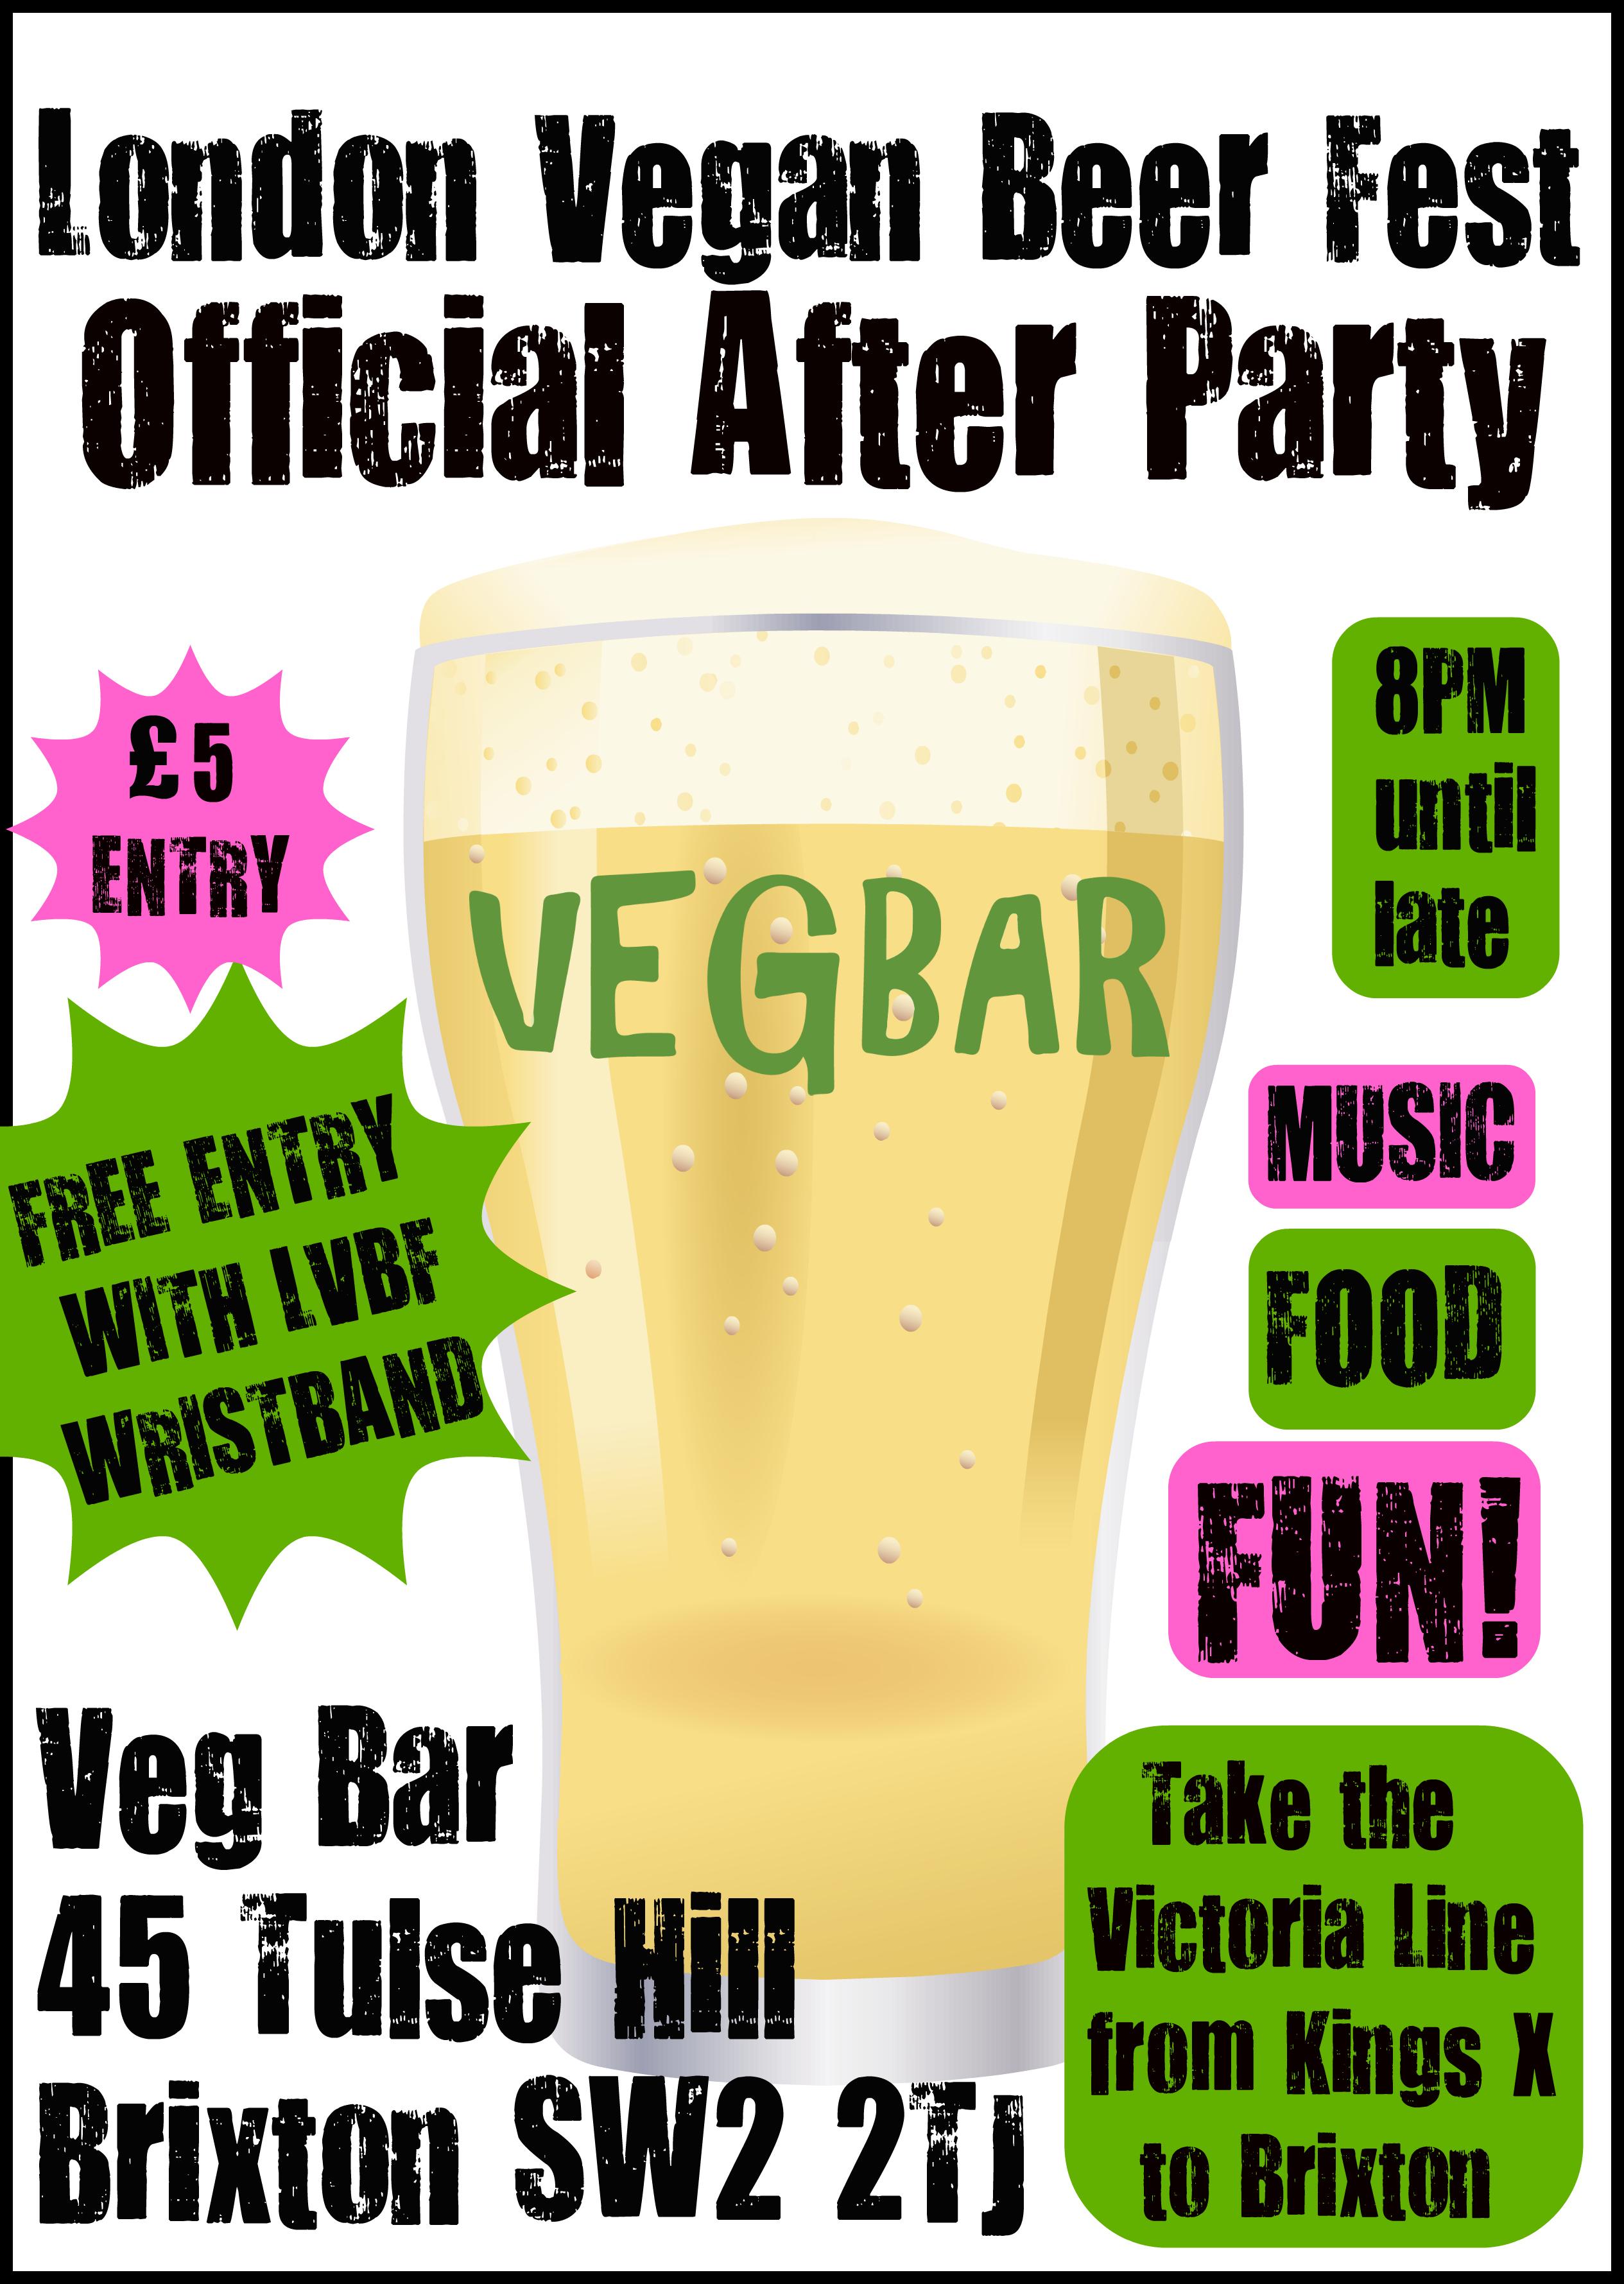 http://fatgayvegan.com/wp-content/uploads/2015/07/after-party-flyer-and-poster1.jpg